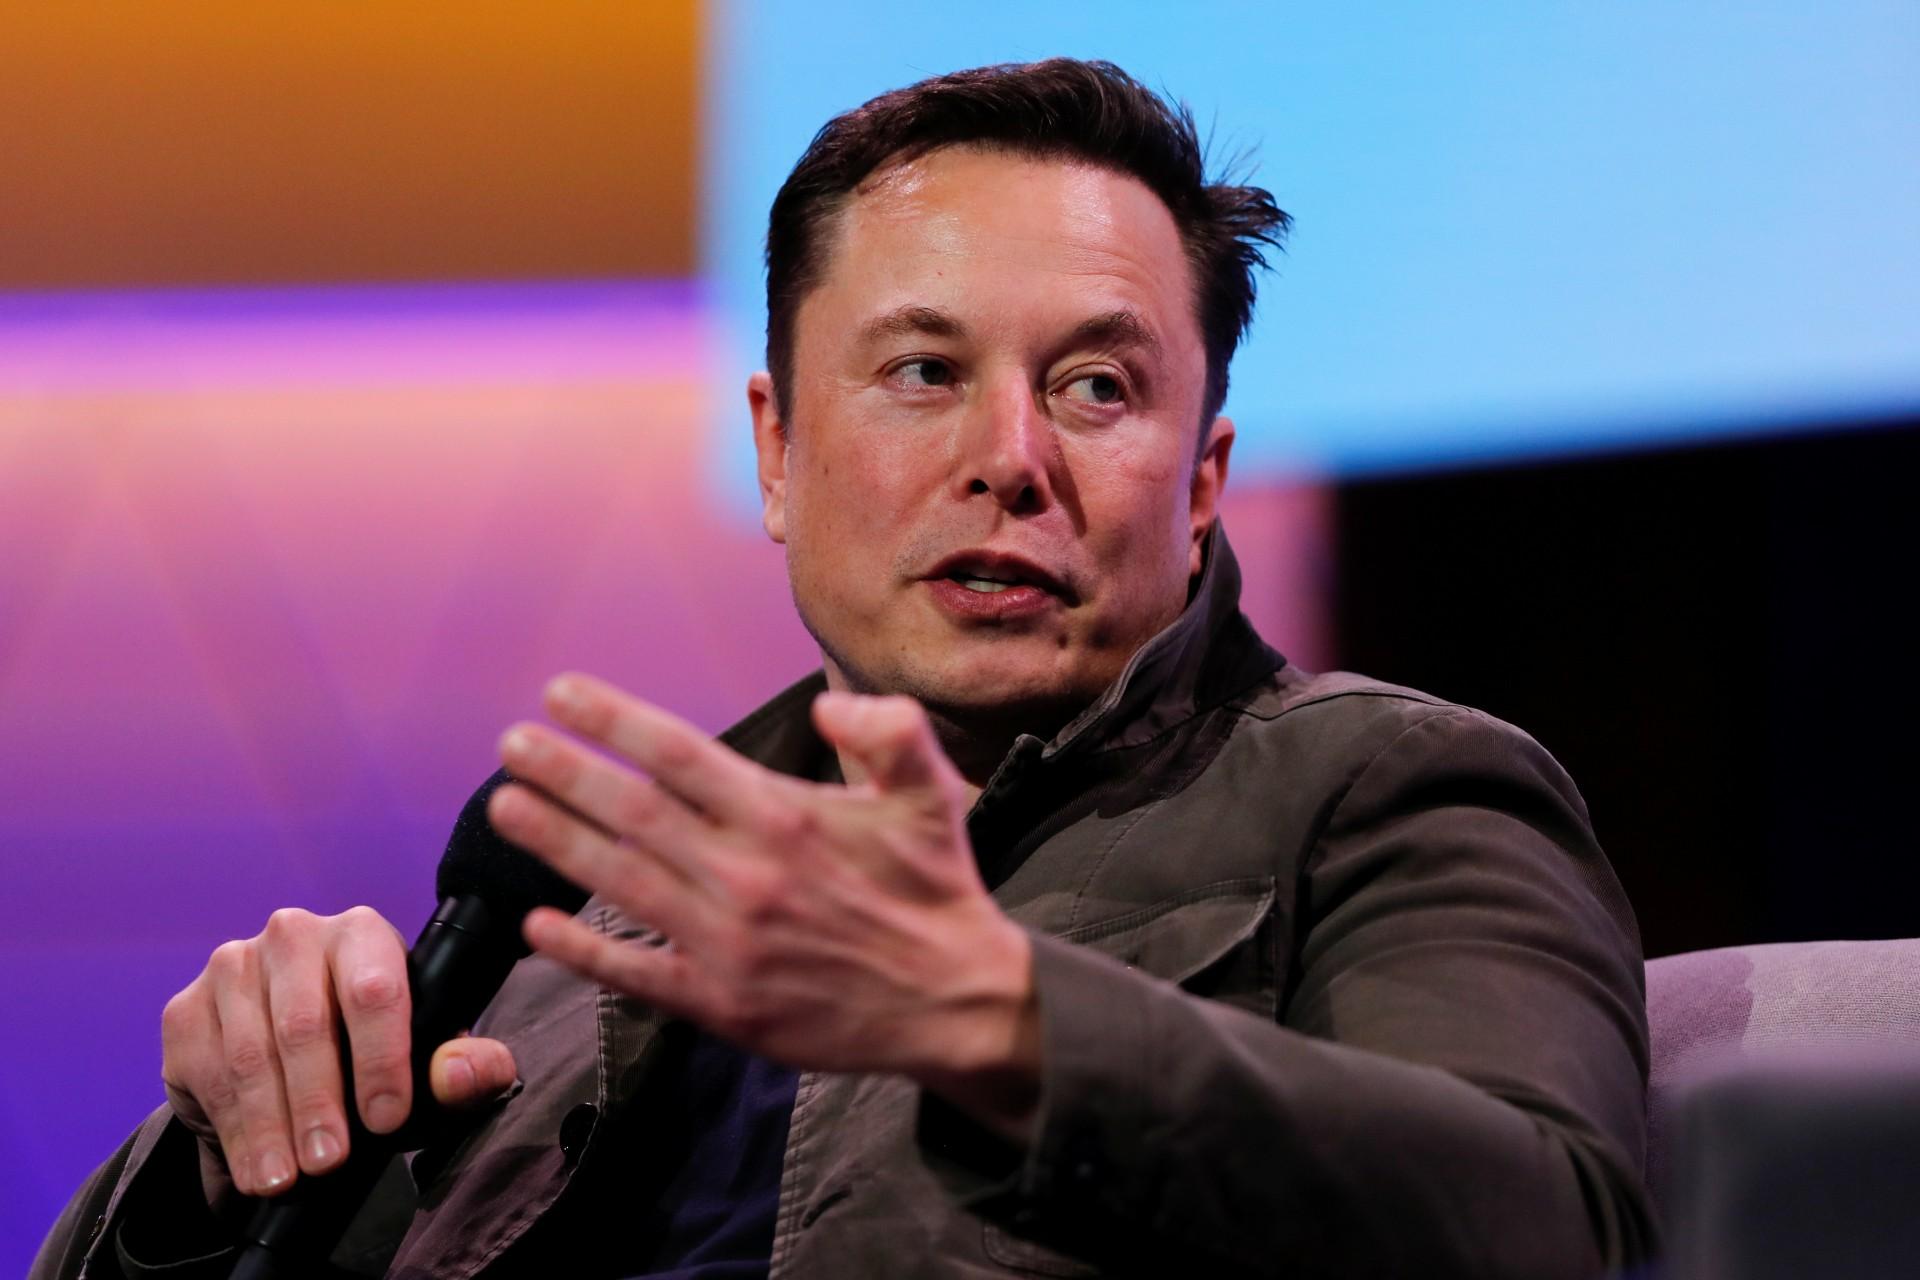 O CEO da Tesla e da SpaceX, Elon Musk